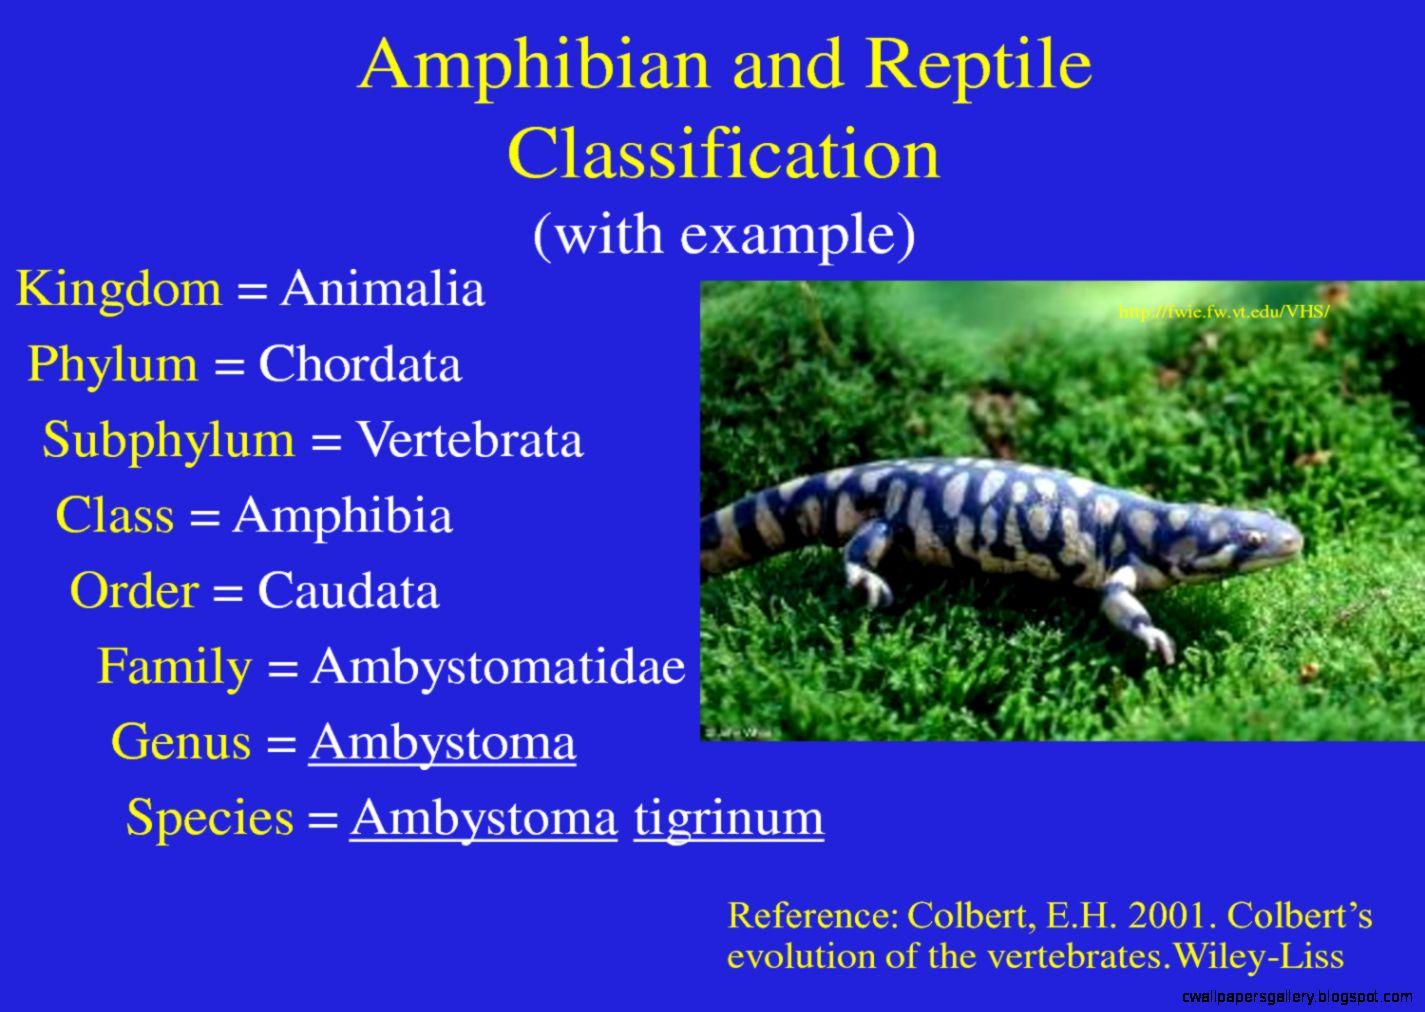 Reptiles Examples